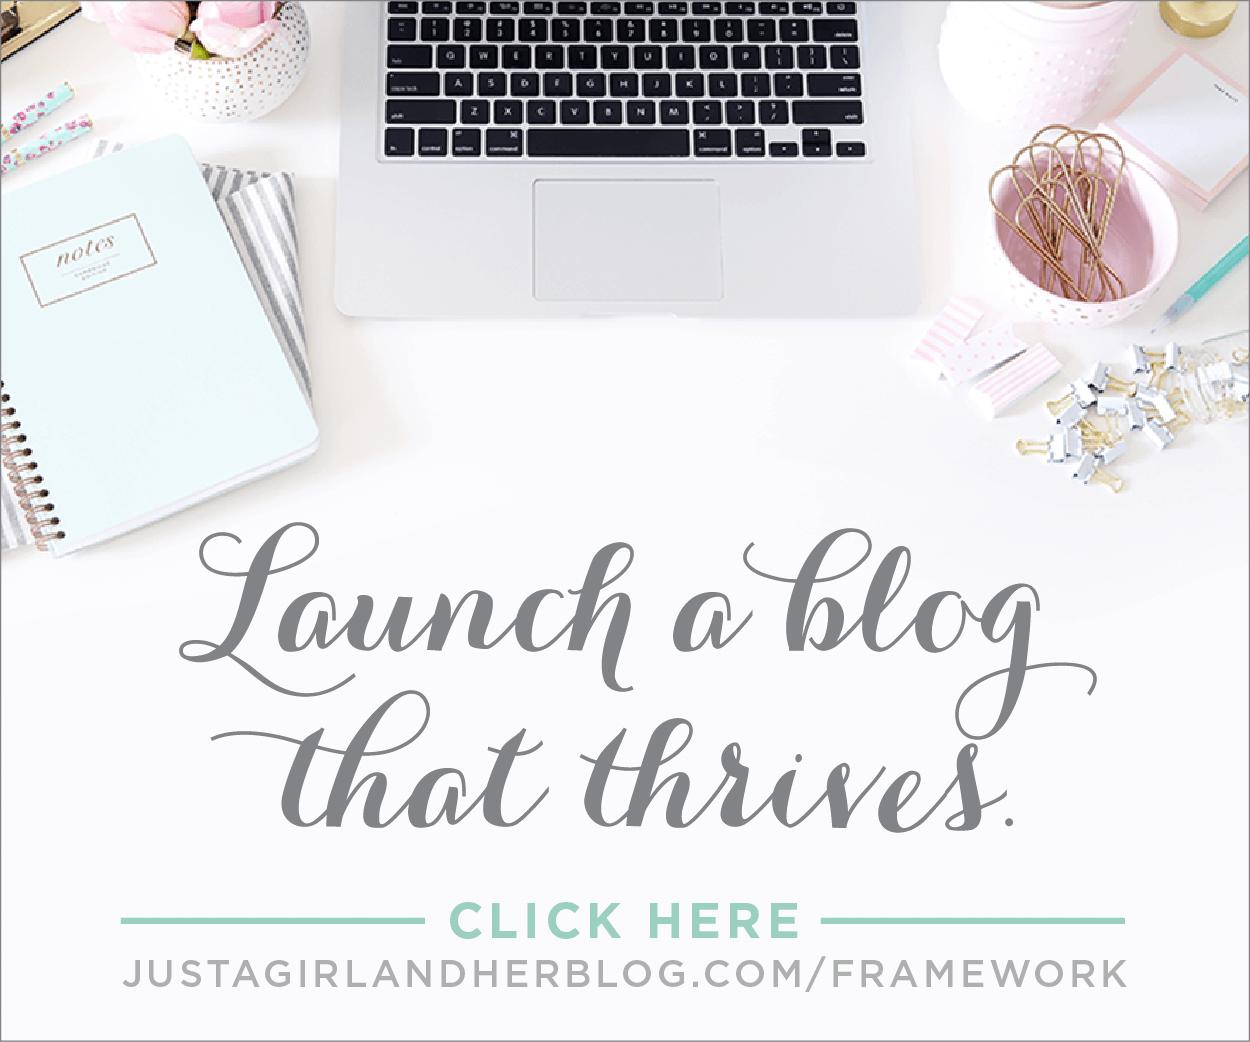 The Ultimate Blogging Handbook